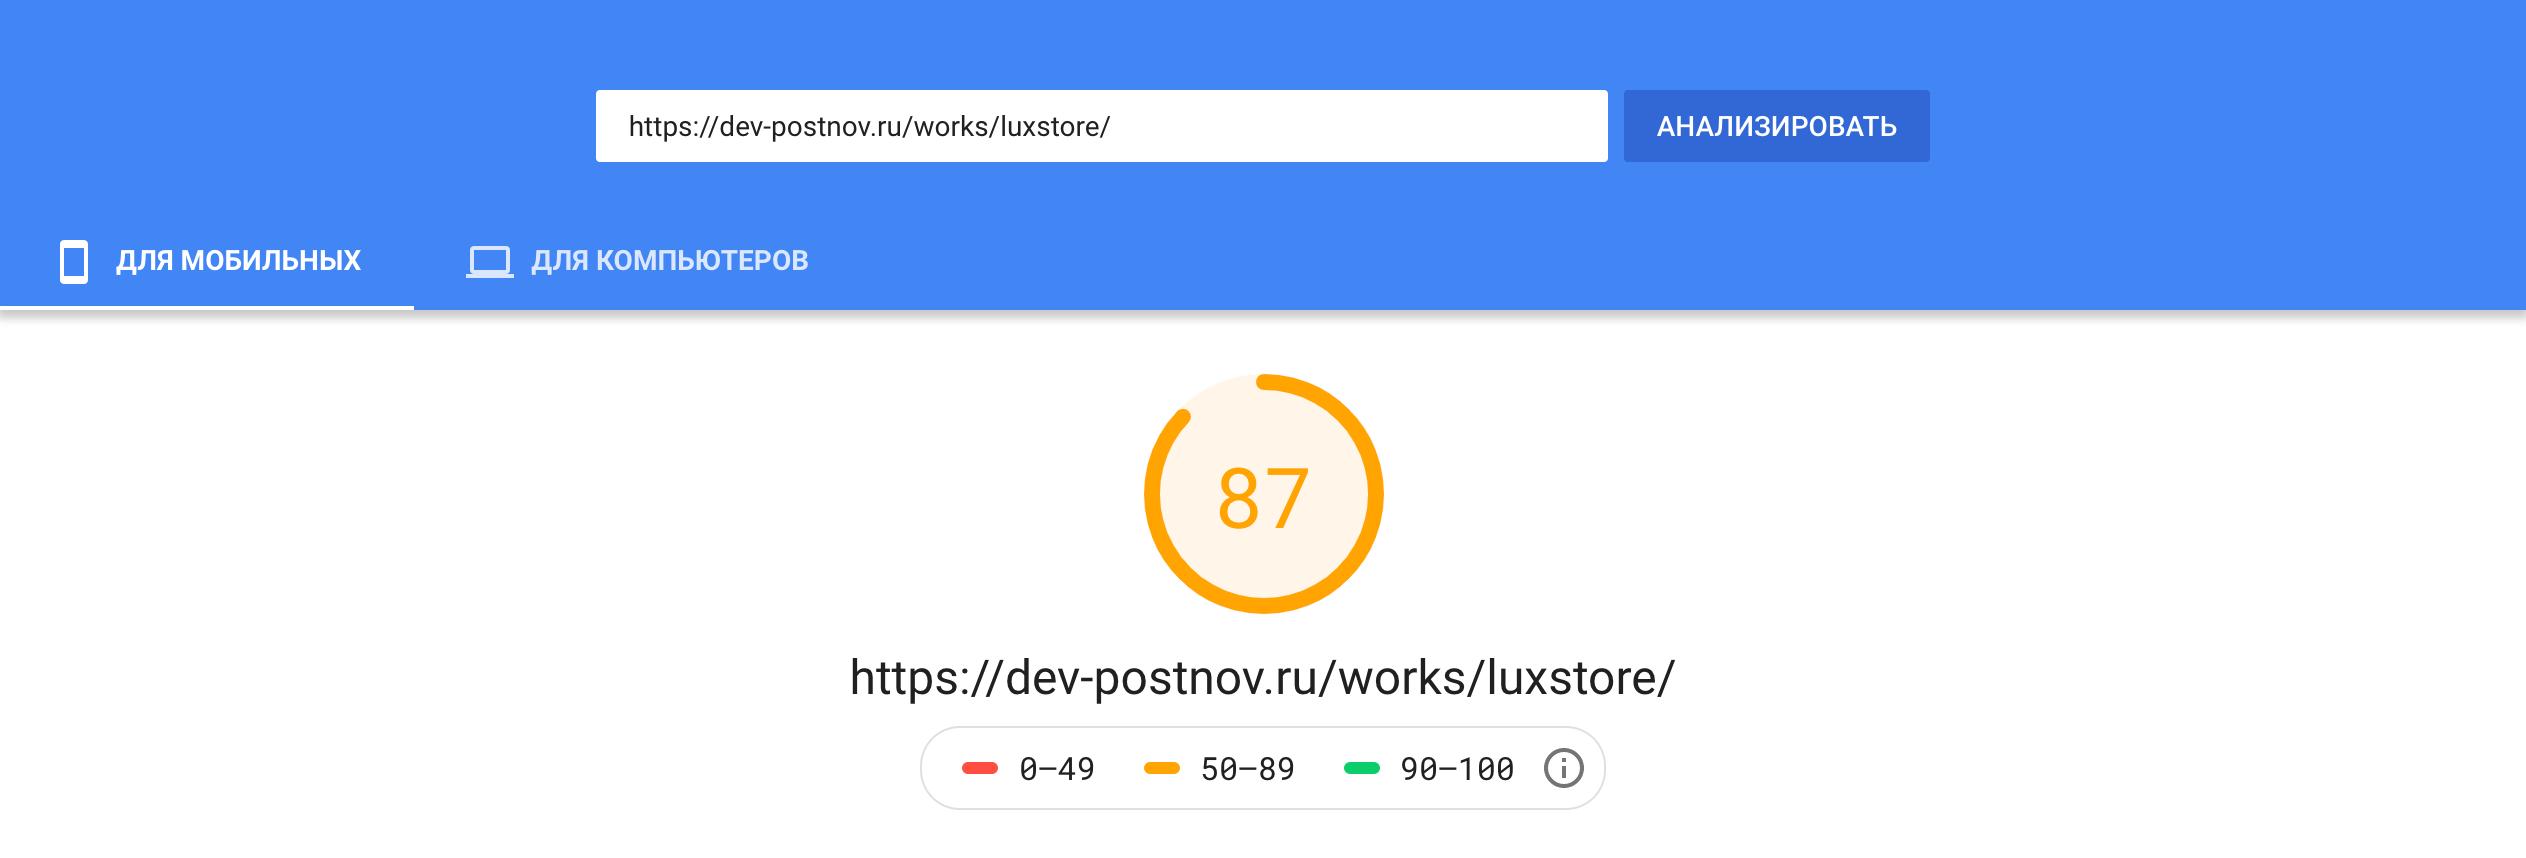 Верстка сайта Luxstore 2